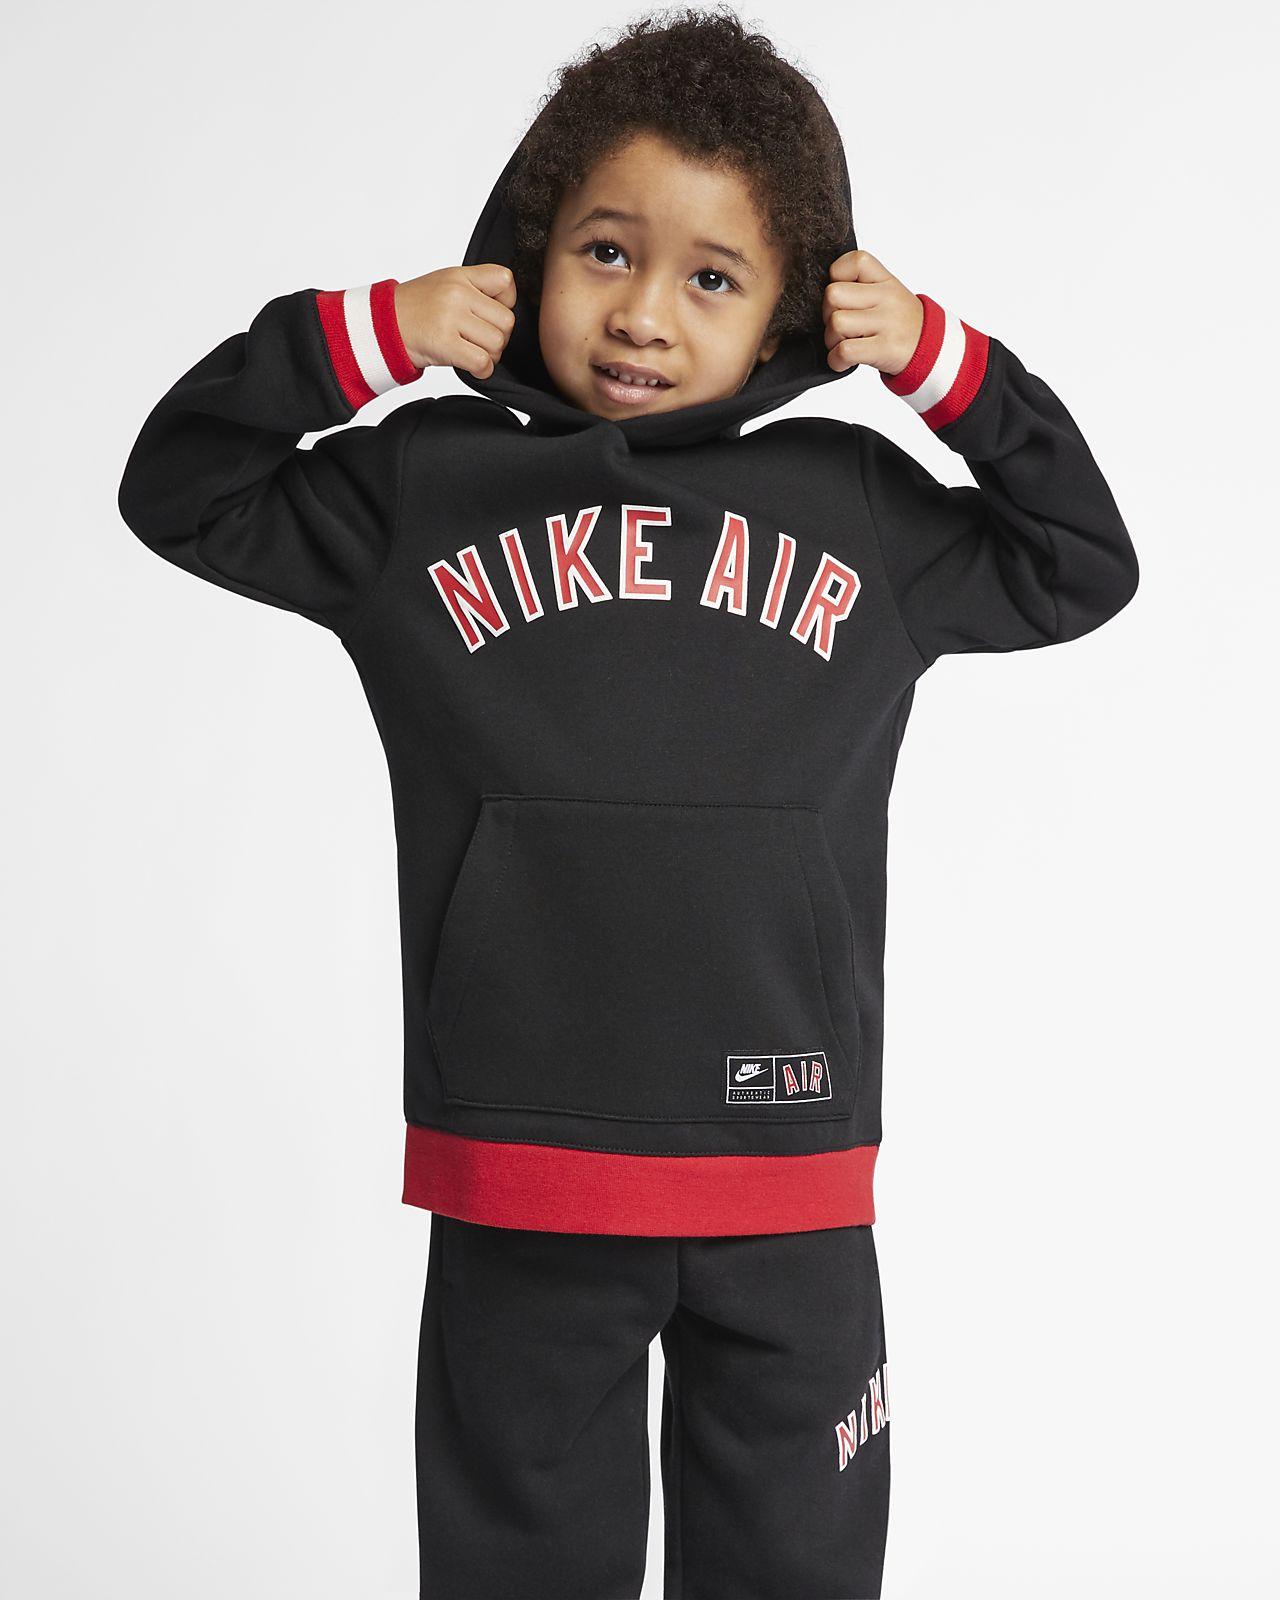 Nike Air 幼童起绒连帽衫